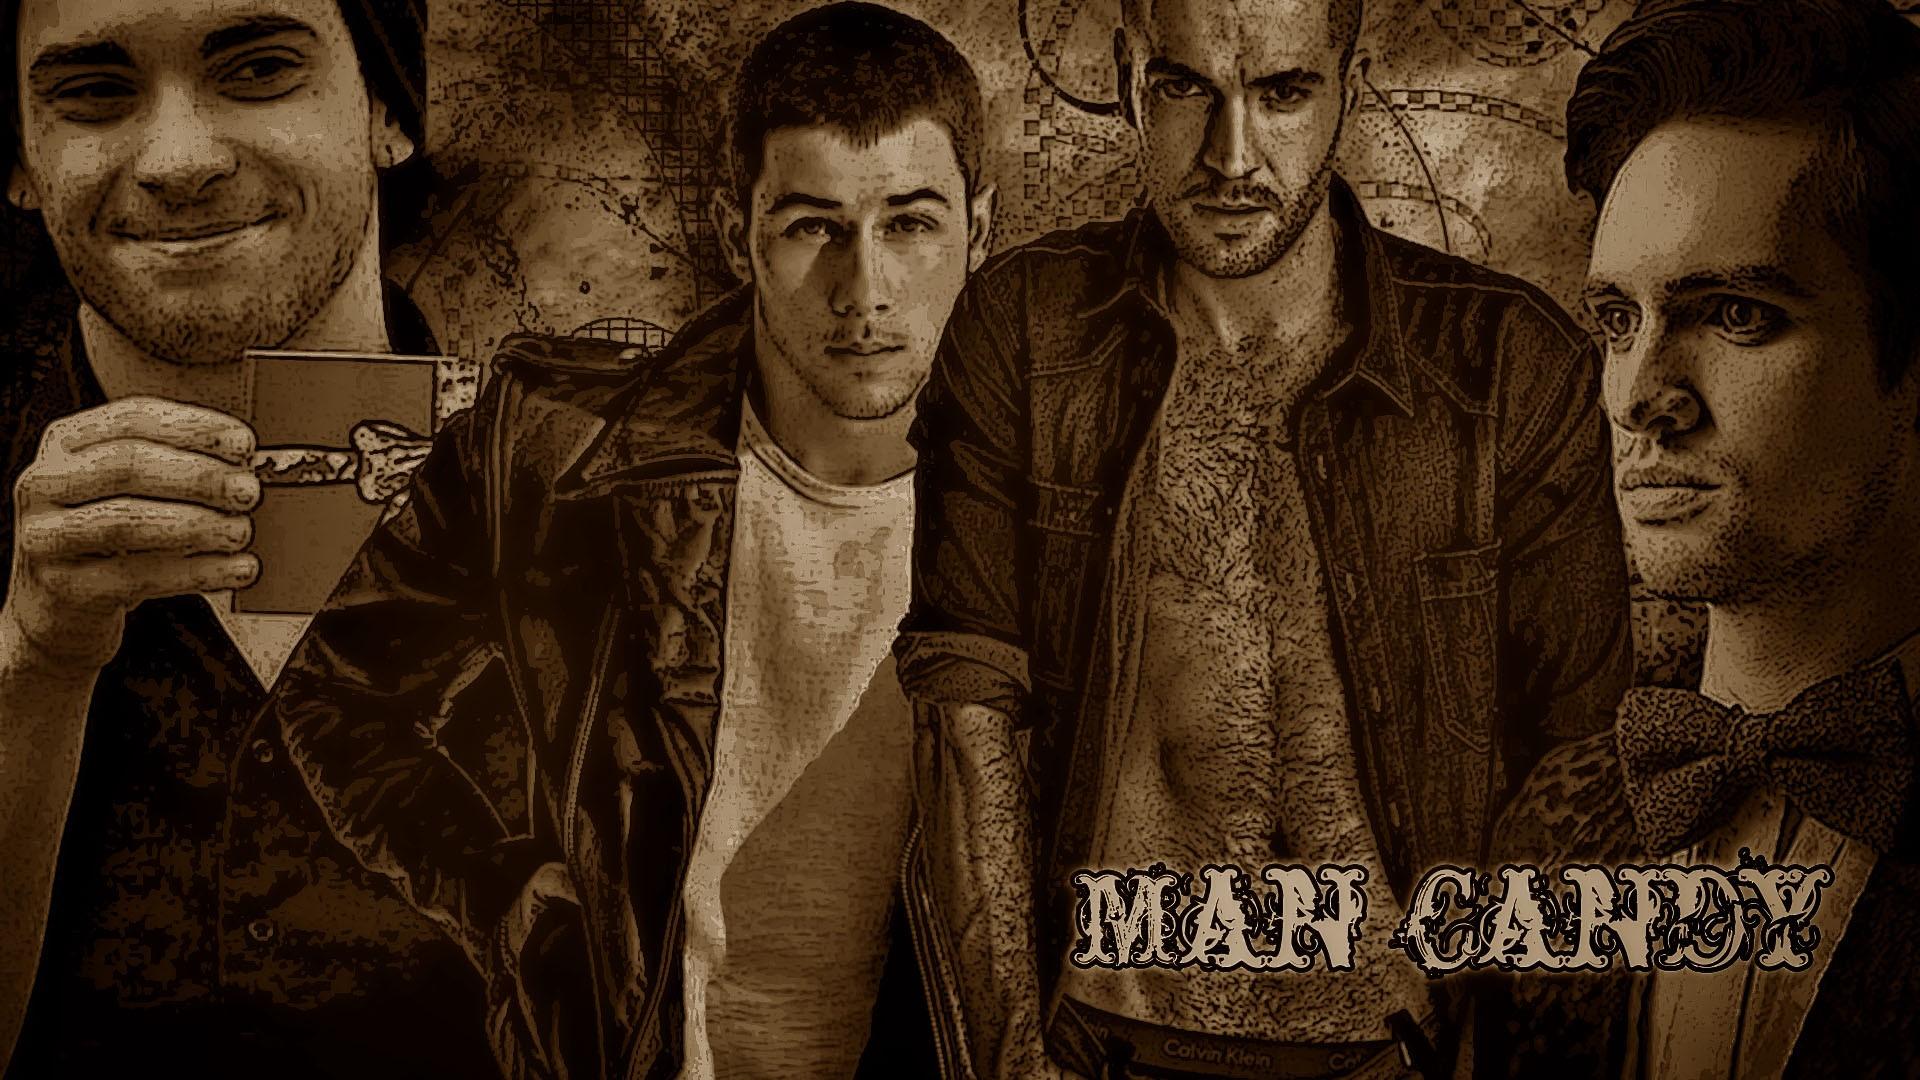 Paramore Taylor York Nick Jonas Shayne Ward Brendon Urie Jonas Brothers Panic at the Disco screenshot 1920x1080 px ancient history Man Candy 523152